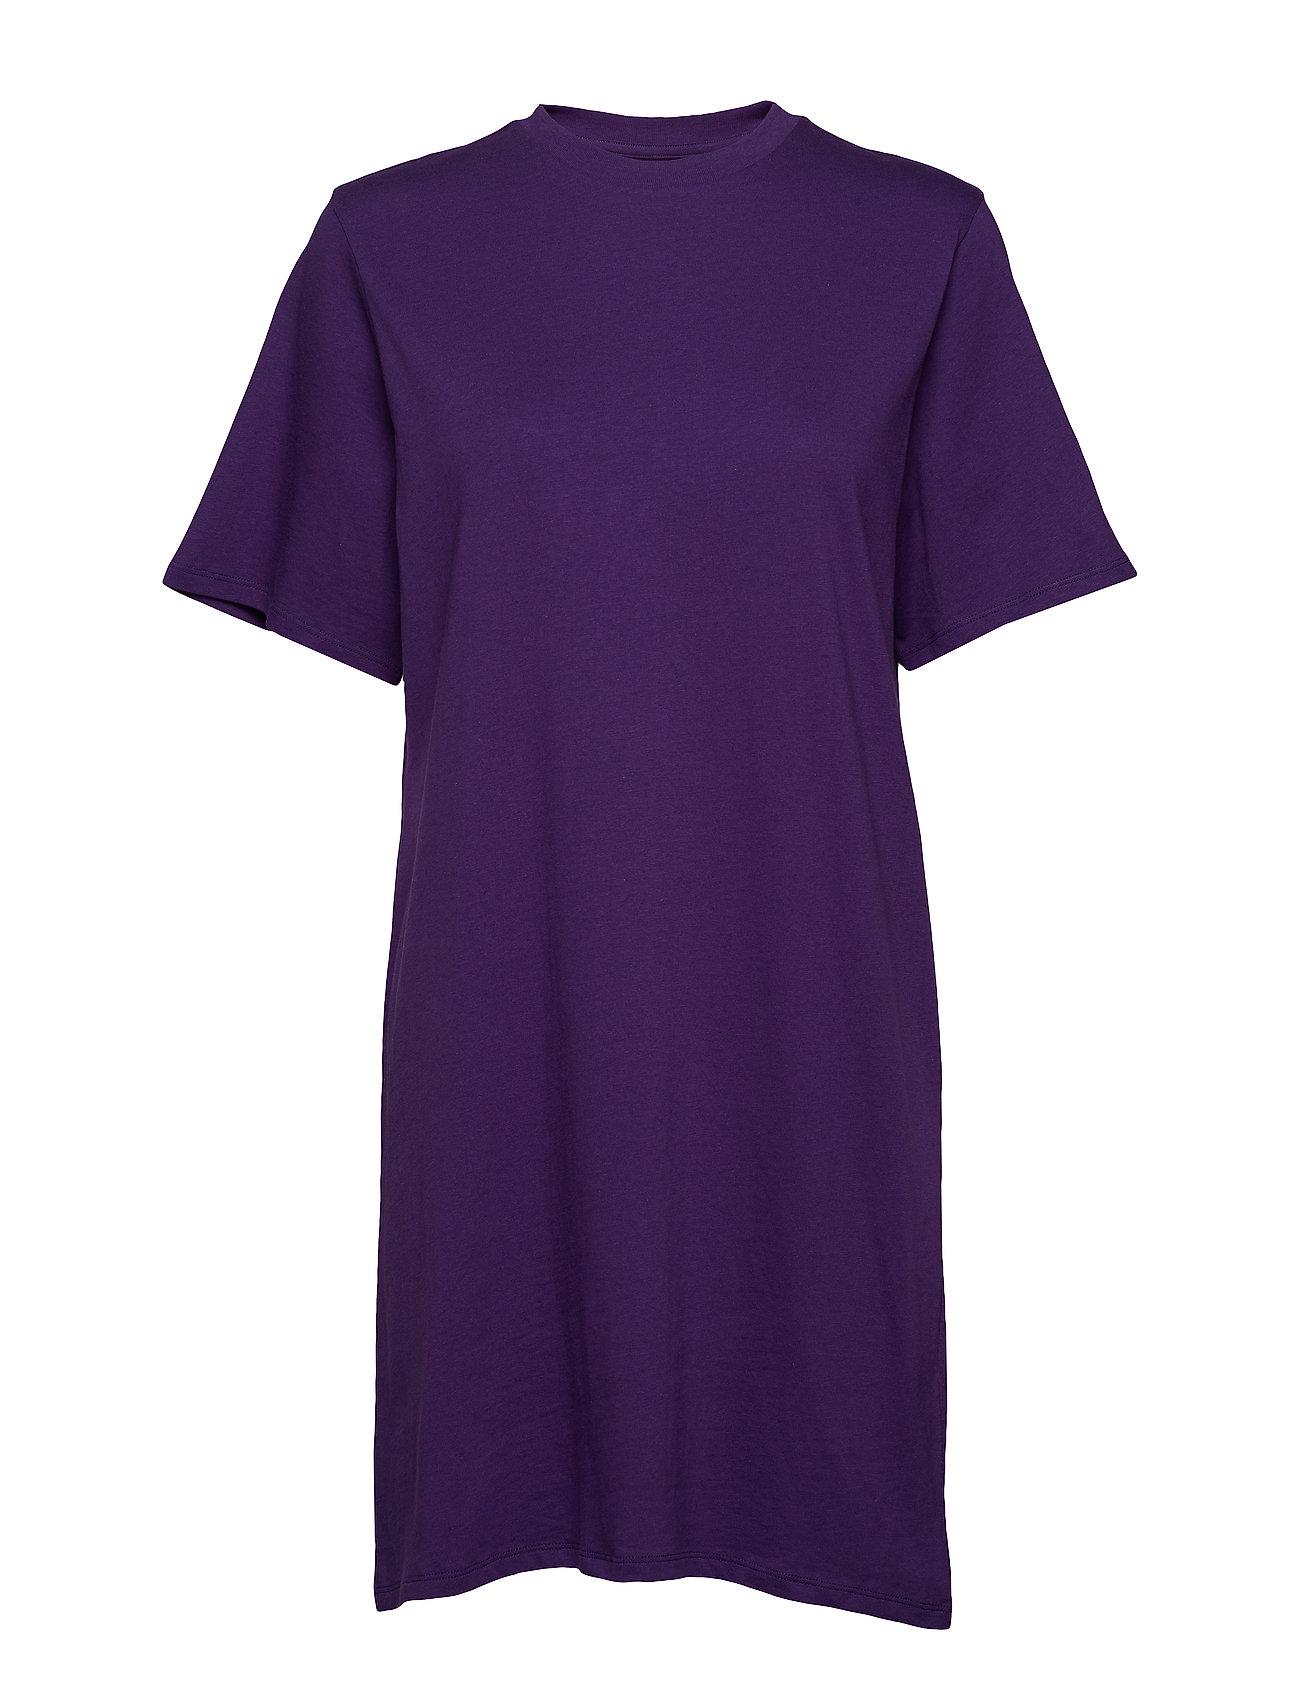 Image of Ivy Tshirt Dress (3118686495)